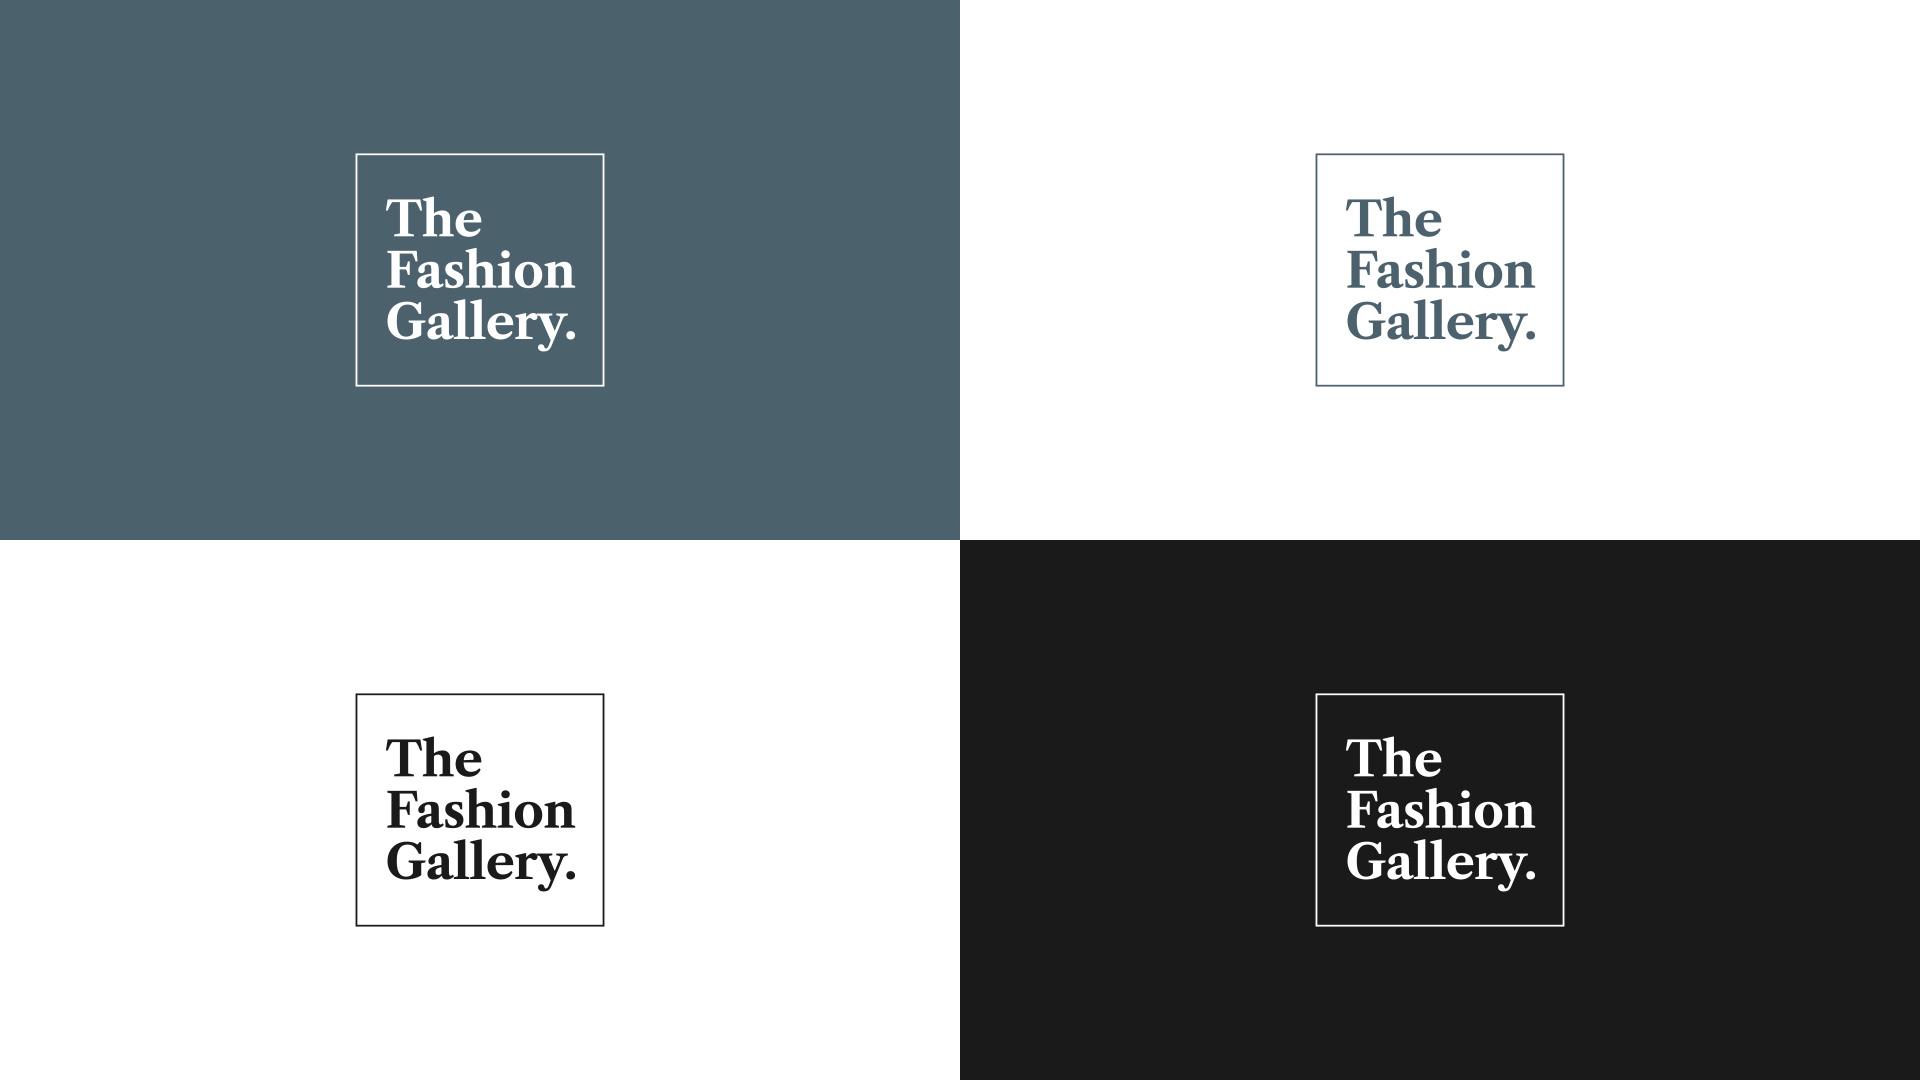 The Fashion Gallery Logos Design Bankfield Museum Halifax Calderdale Council IDEA Design Rotherham Sheffield